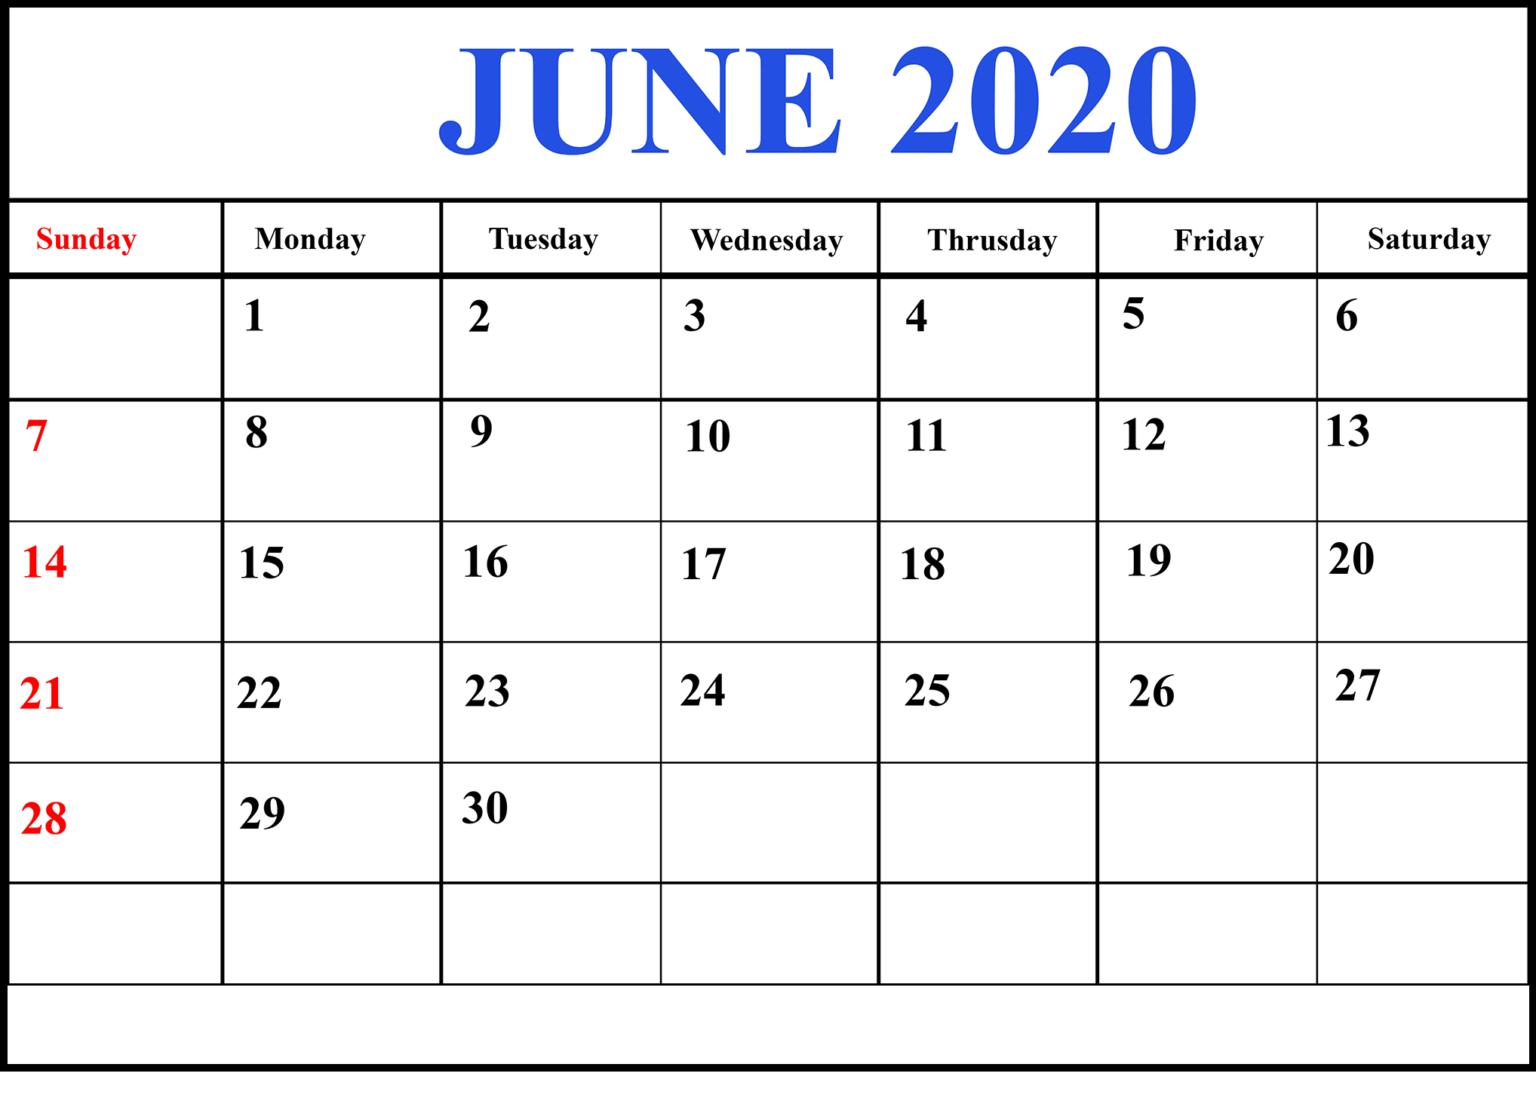 Print June 2020 Calendar Excel Sheet in 2020 Excel